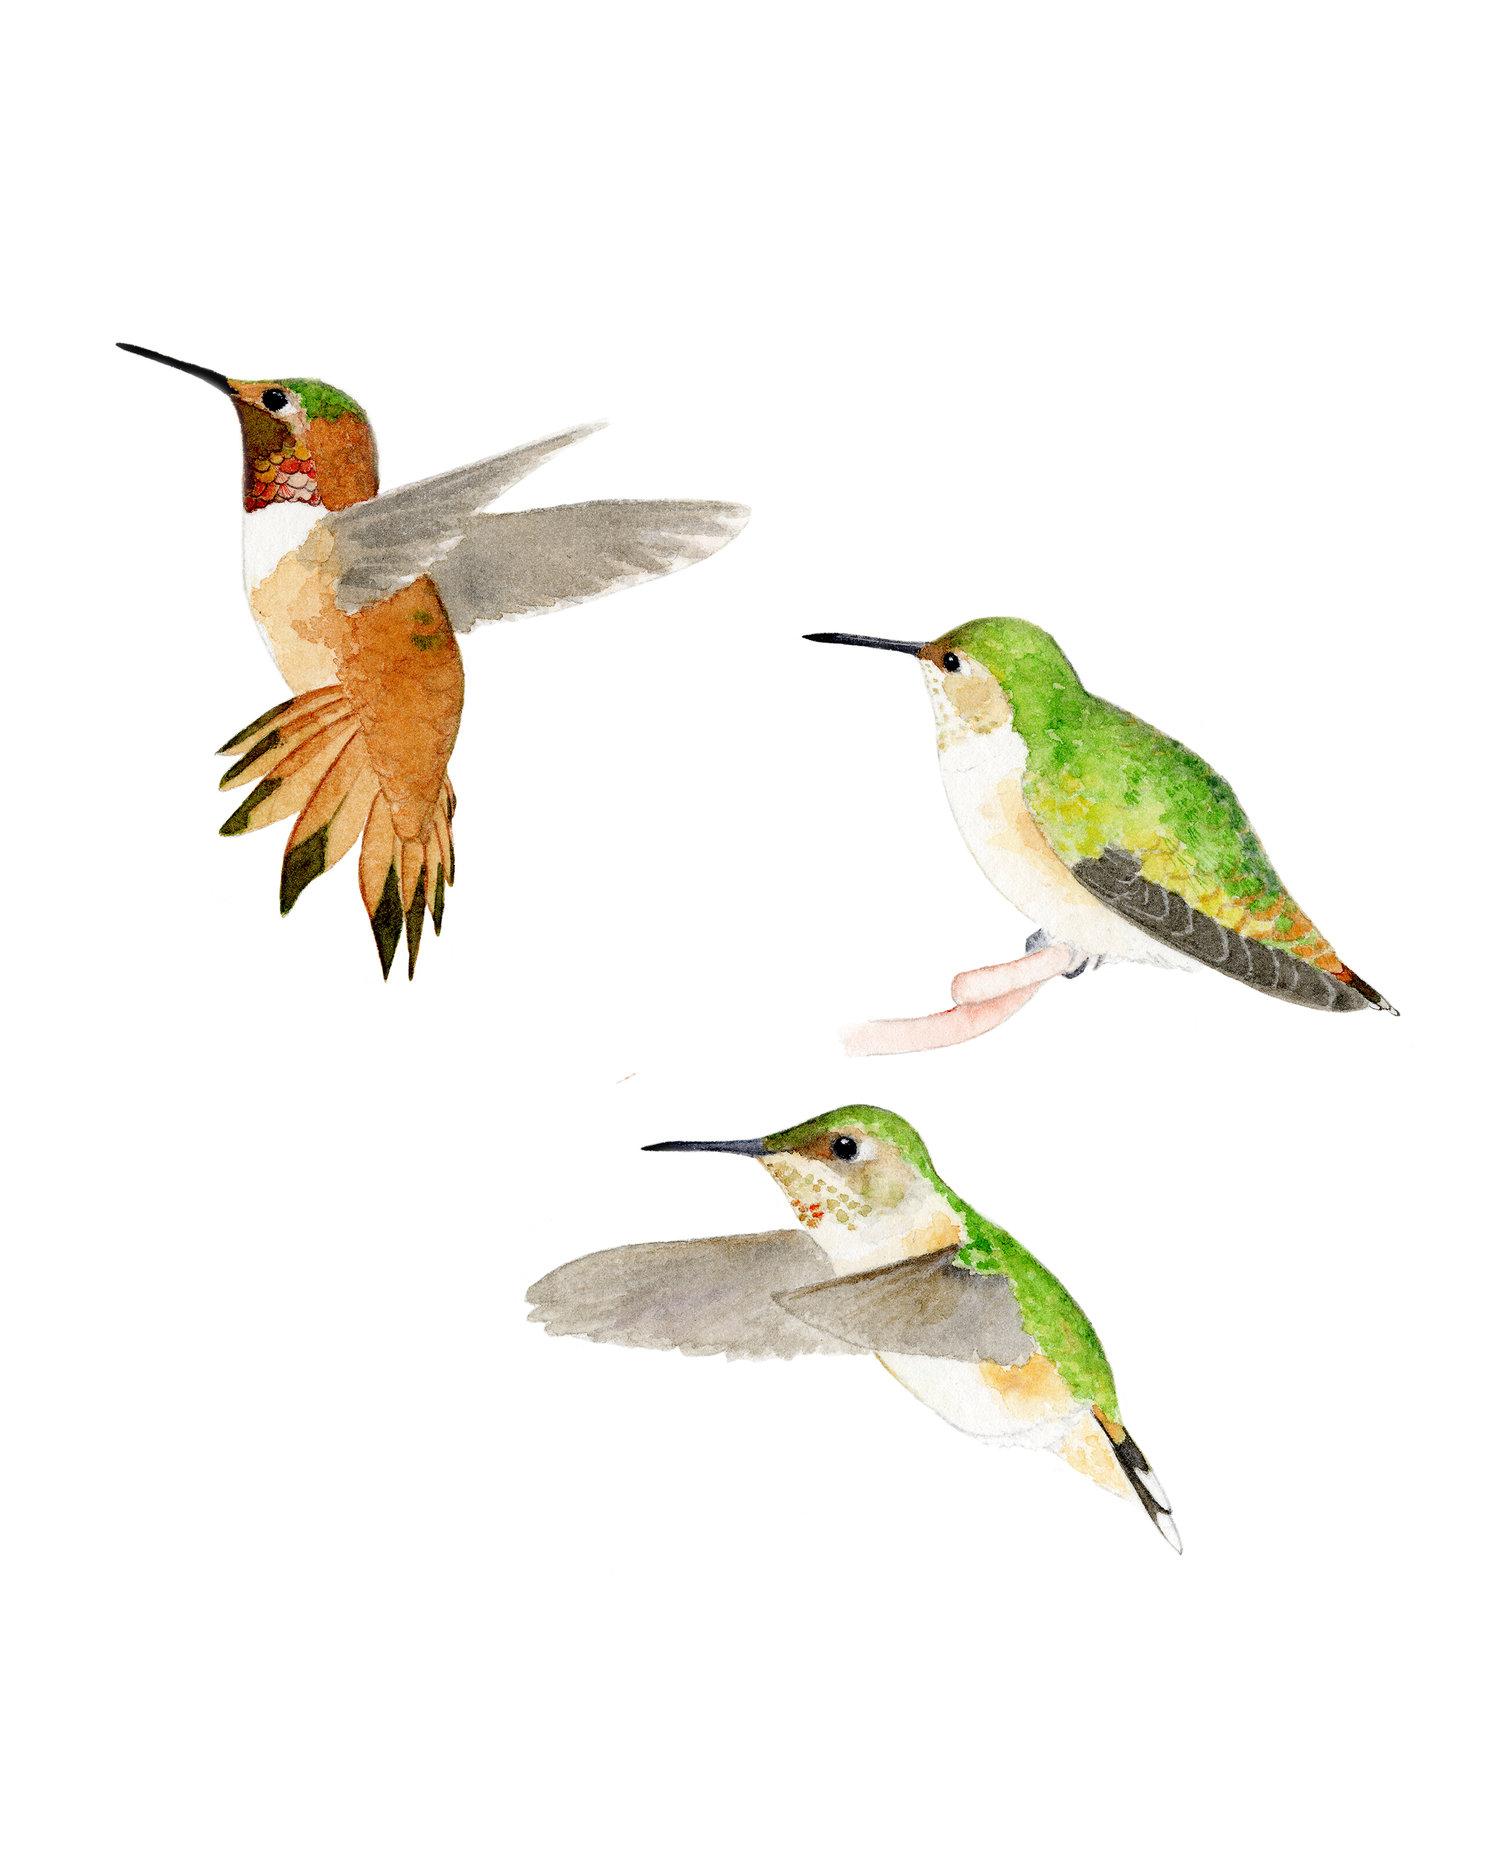 Rufous Hummingbirds (Selasphorus rufus)